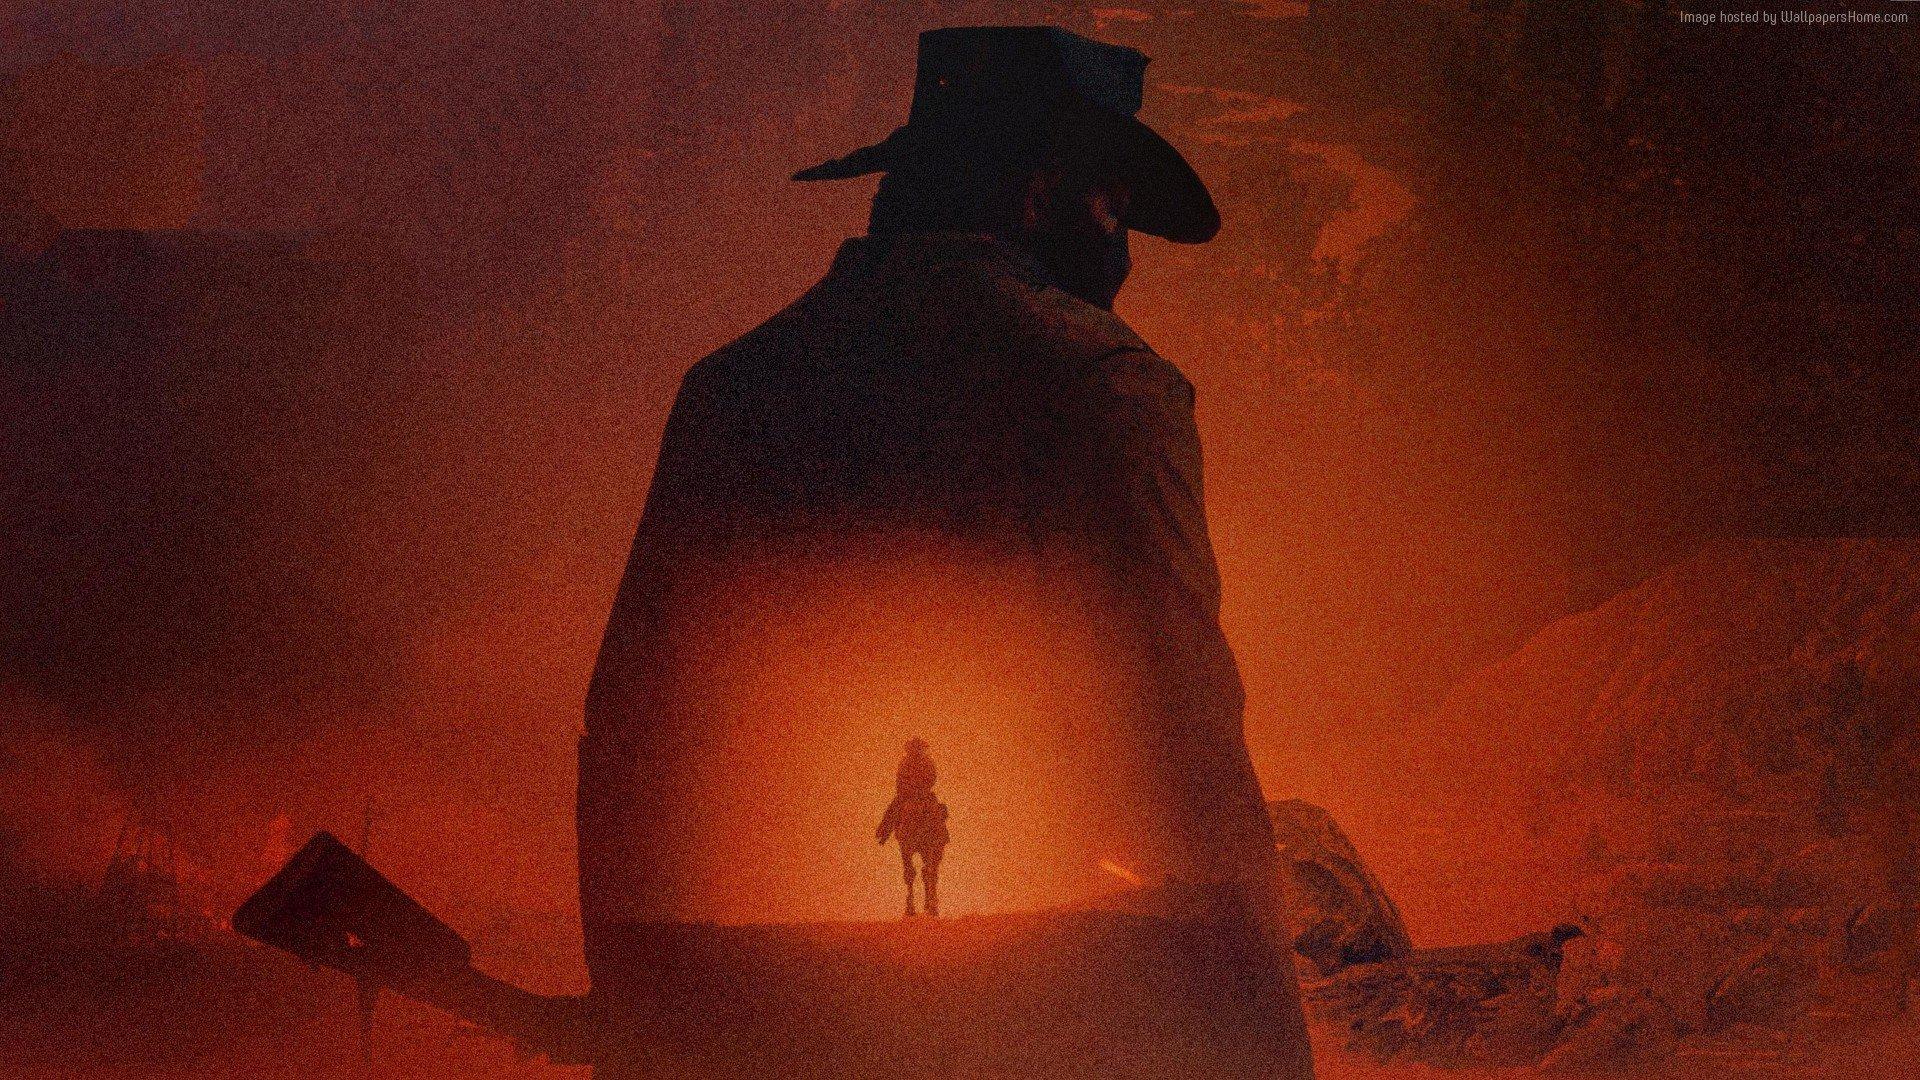 A09B97 Red Dead Redemption 2 1920X1080 Poster Artwork 4K 18204